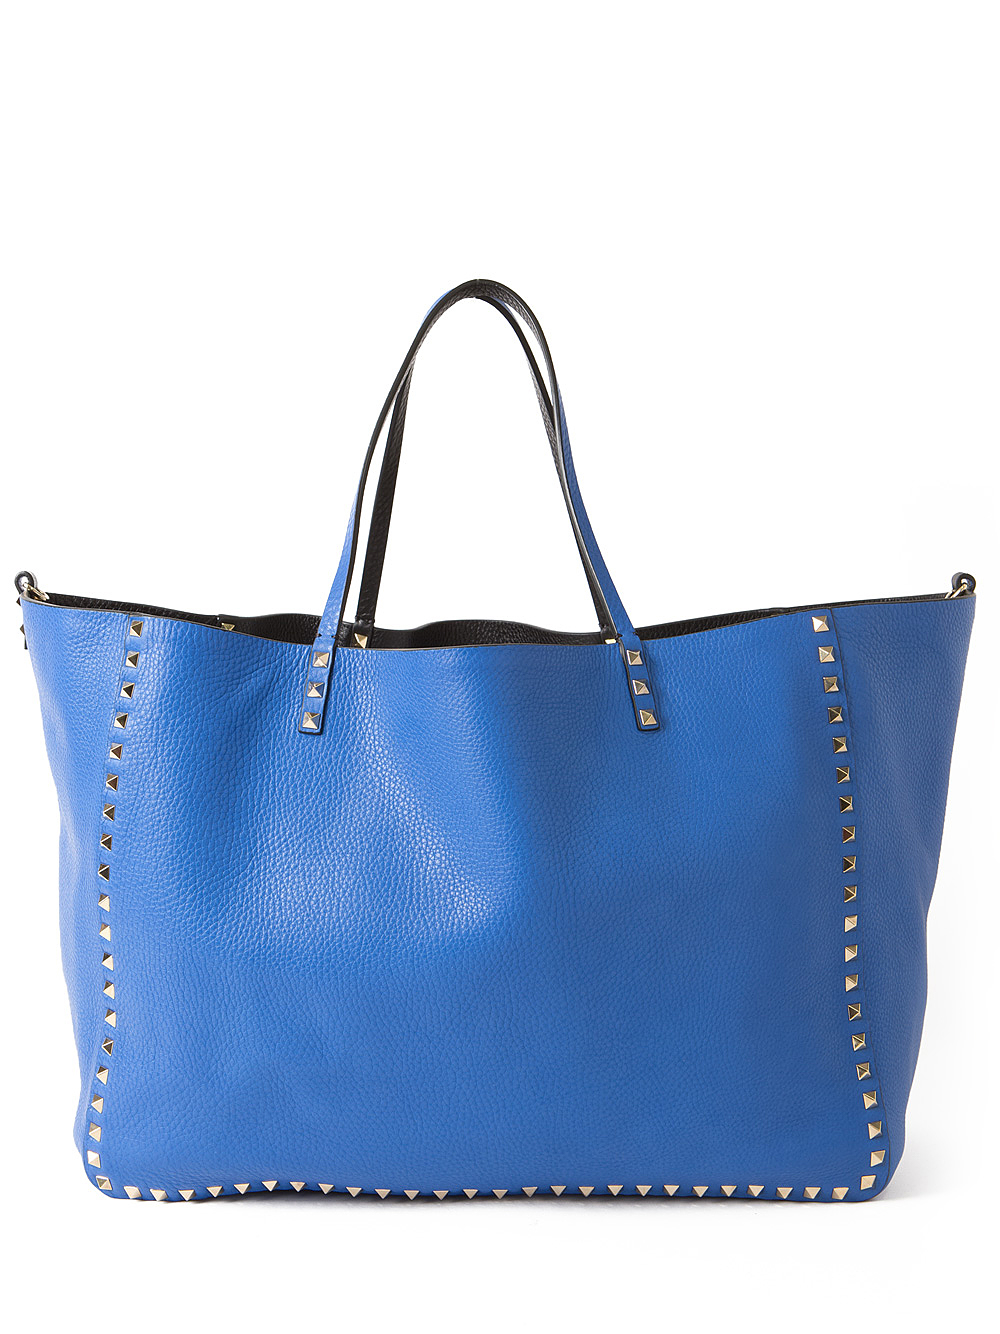 bee1c0105b Valentino Reversible Rockstud Tote in Blue - Lyst